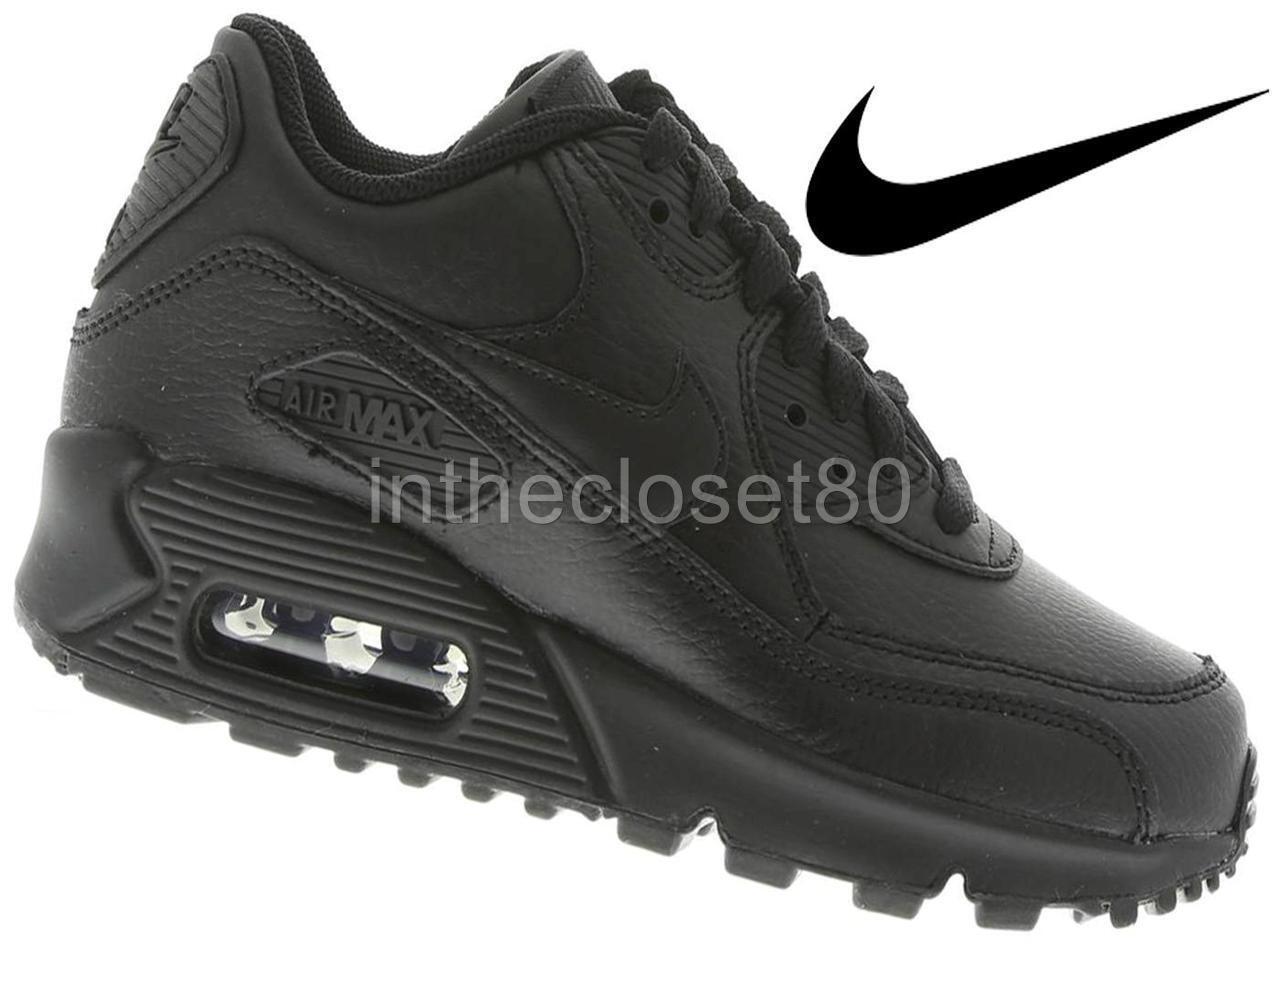 Nike Air Max 90 GS Triple Black Leather Juniors Boys Girls Womens Trainers